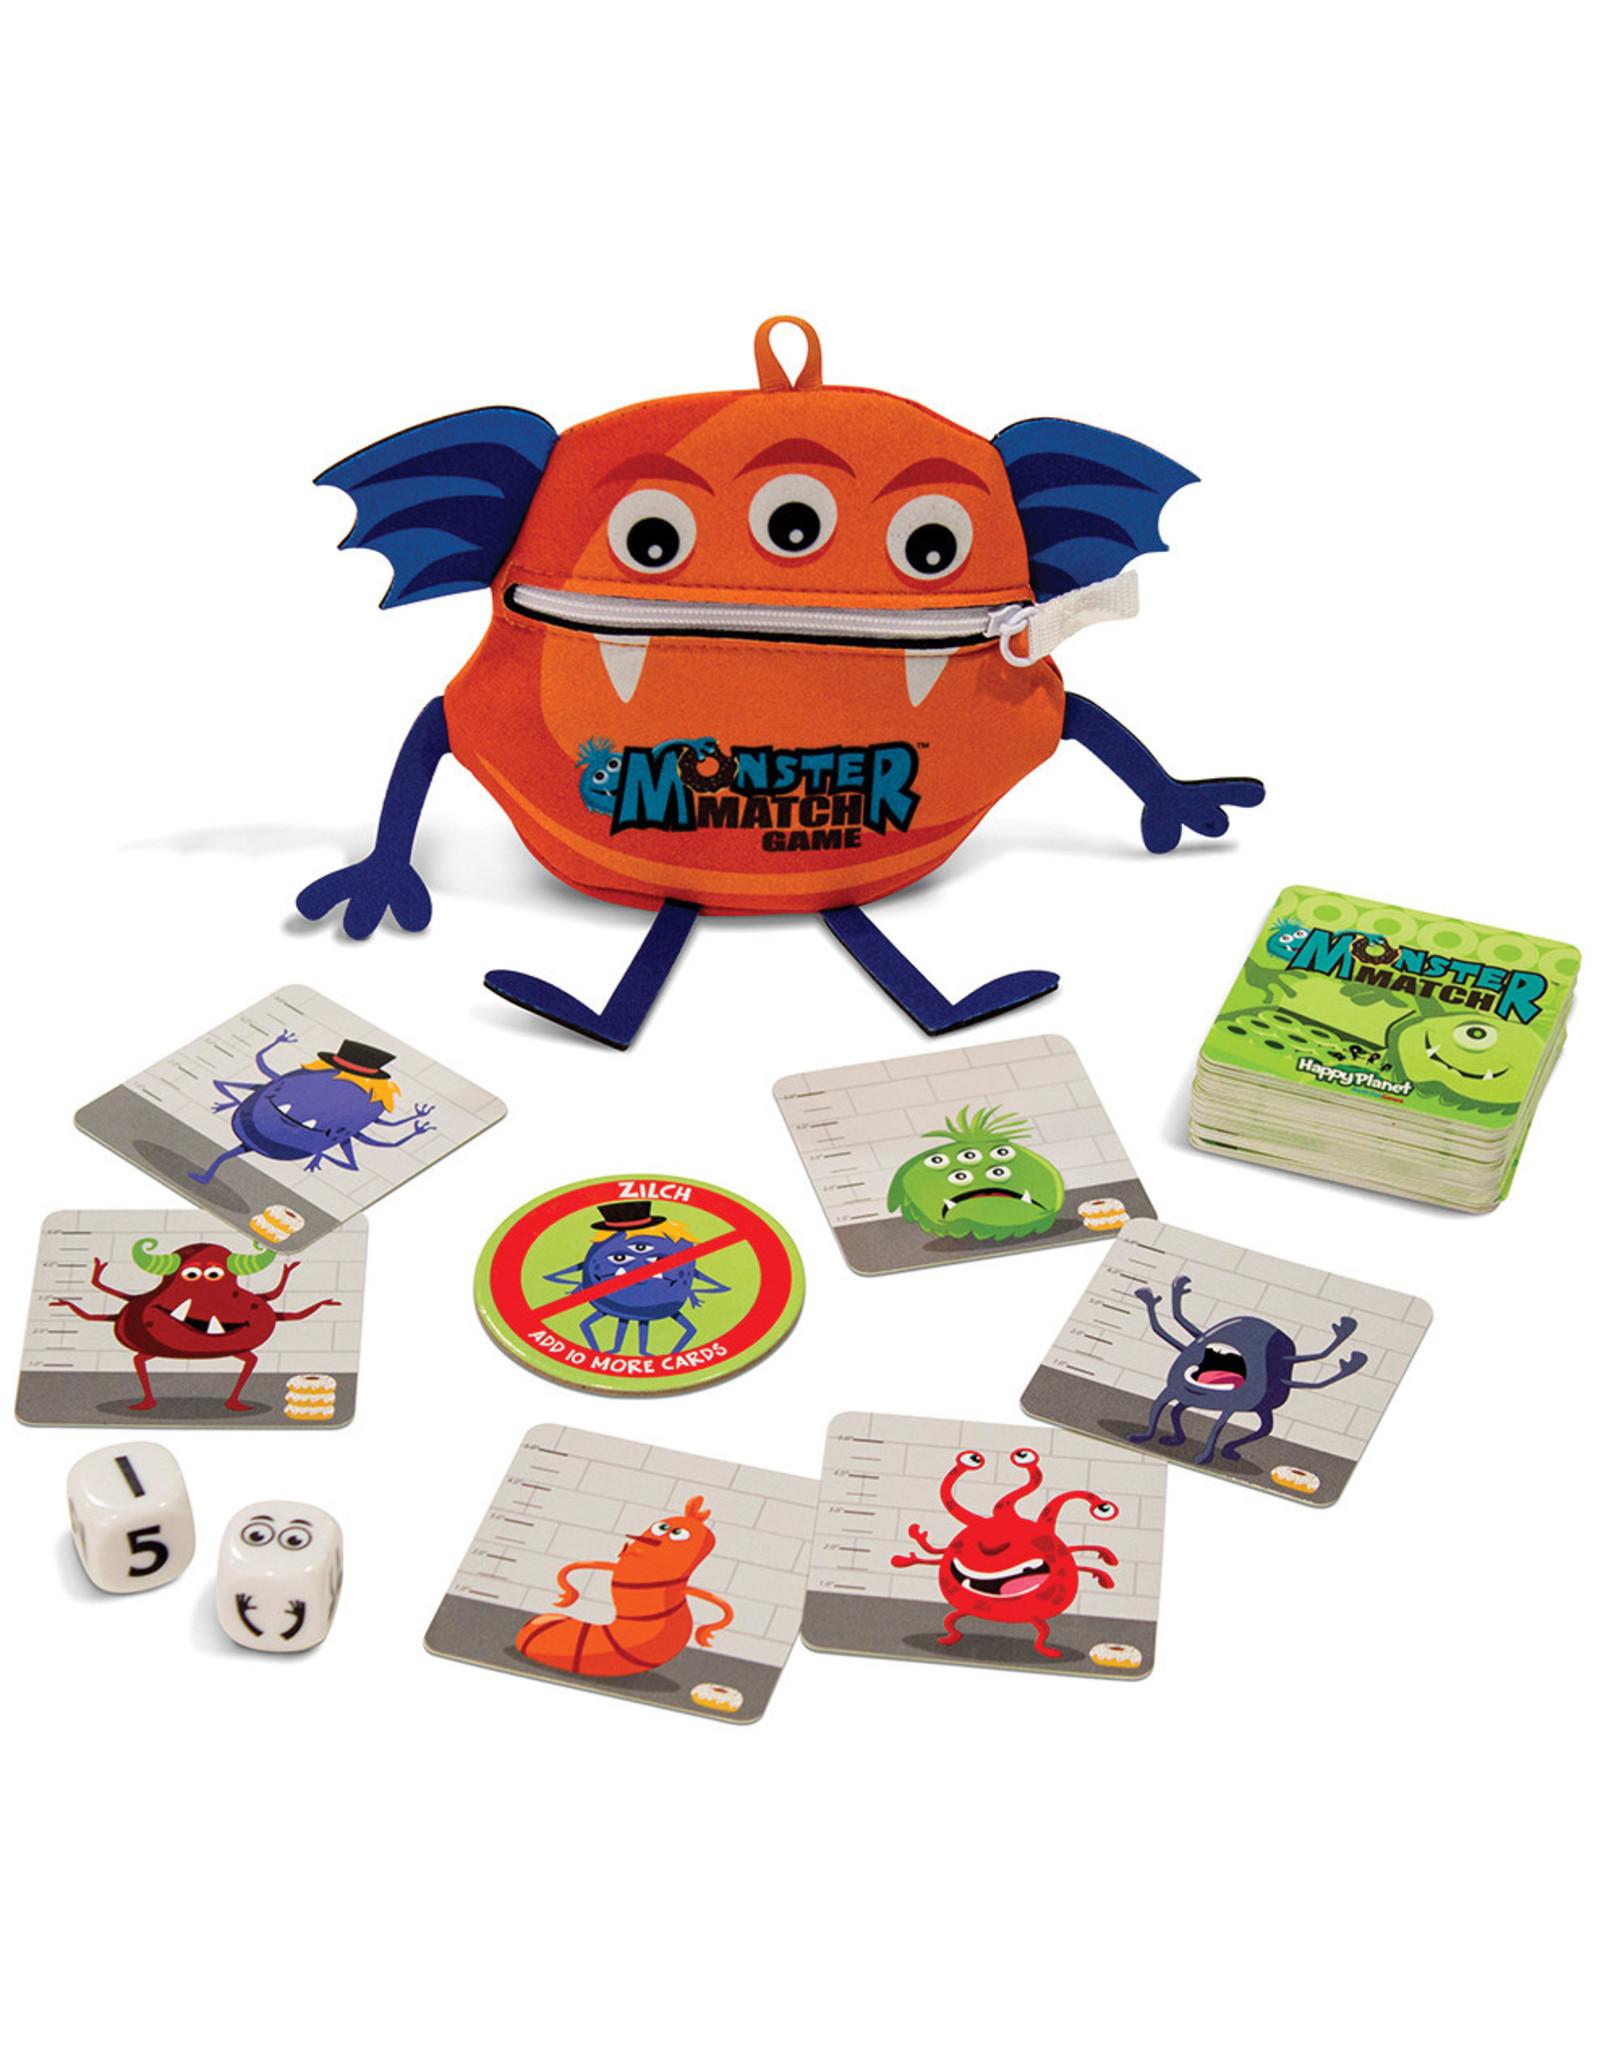 North Star Games Monster Match